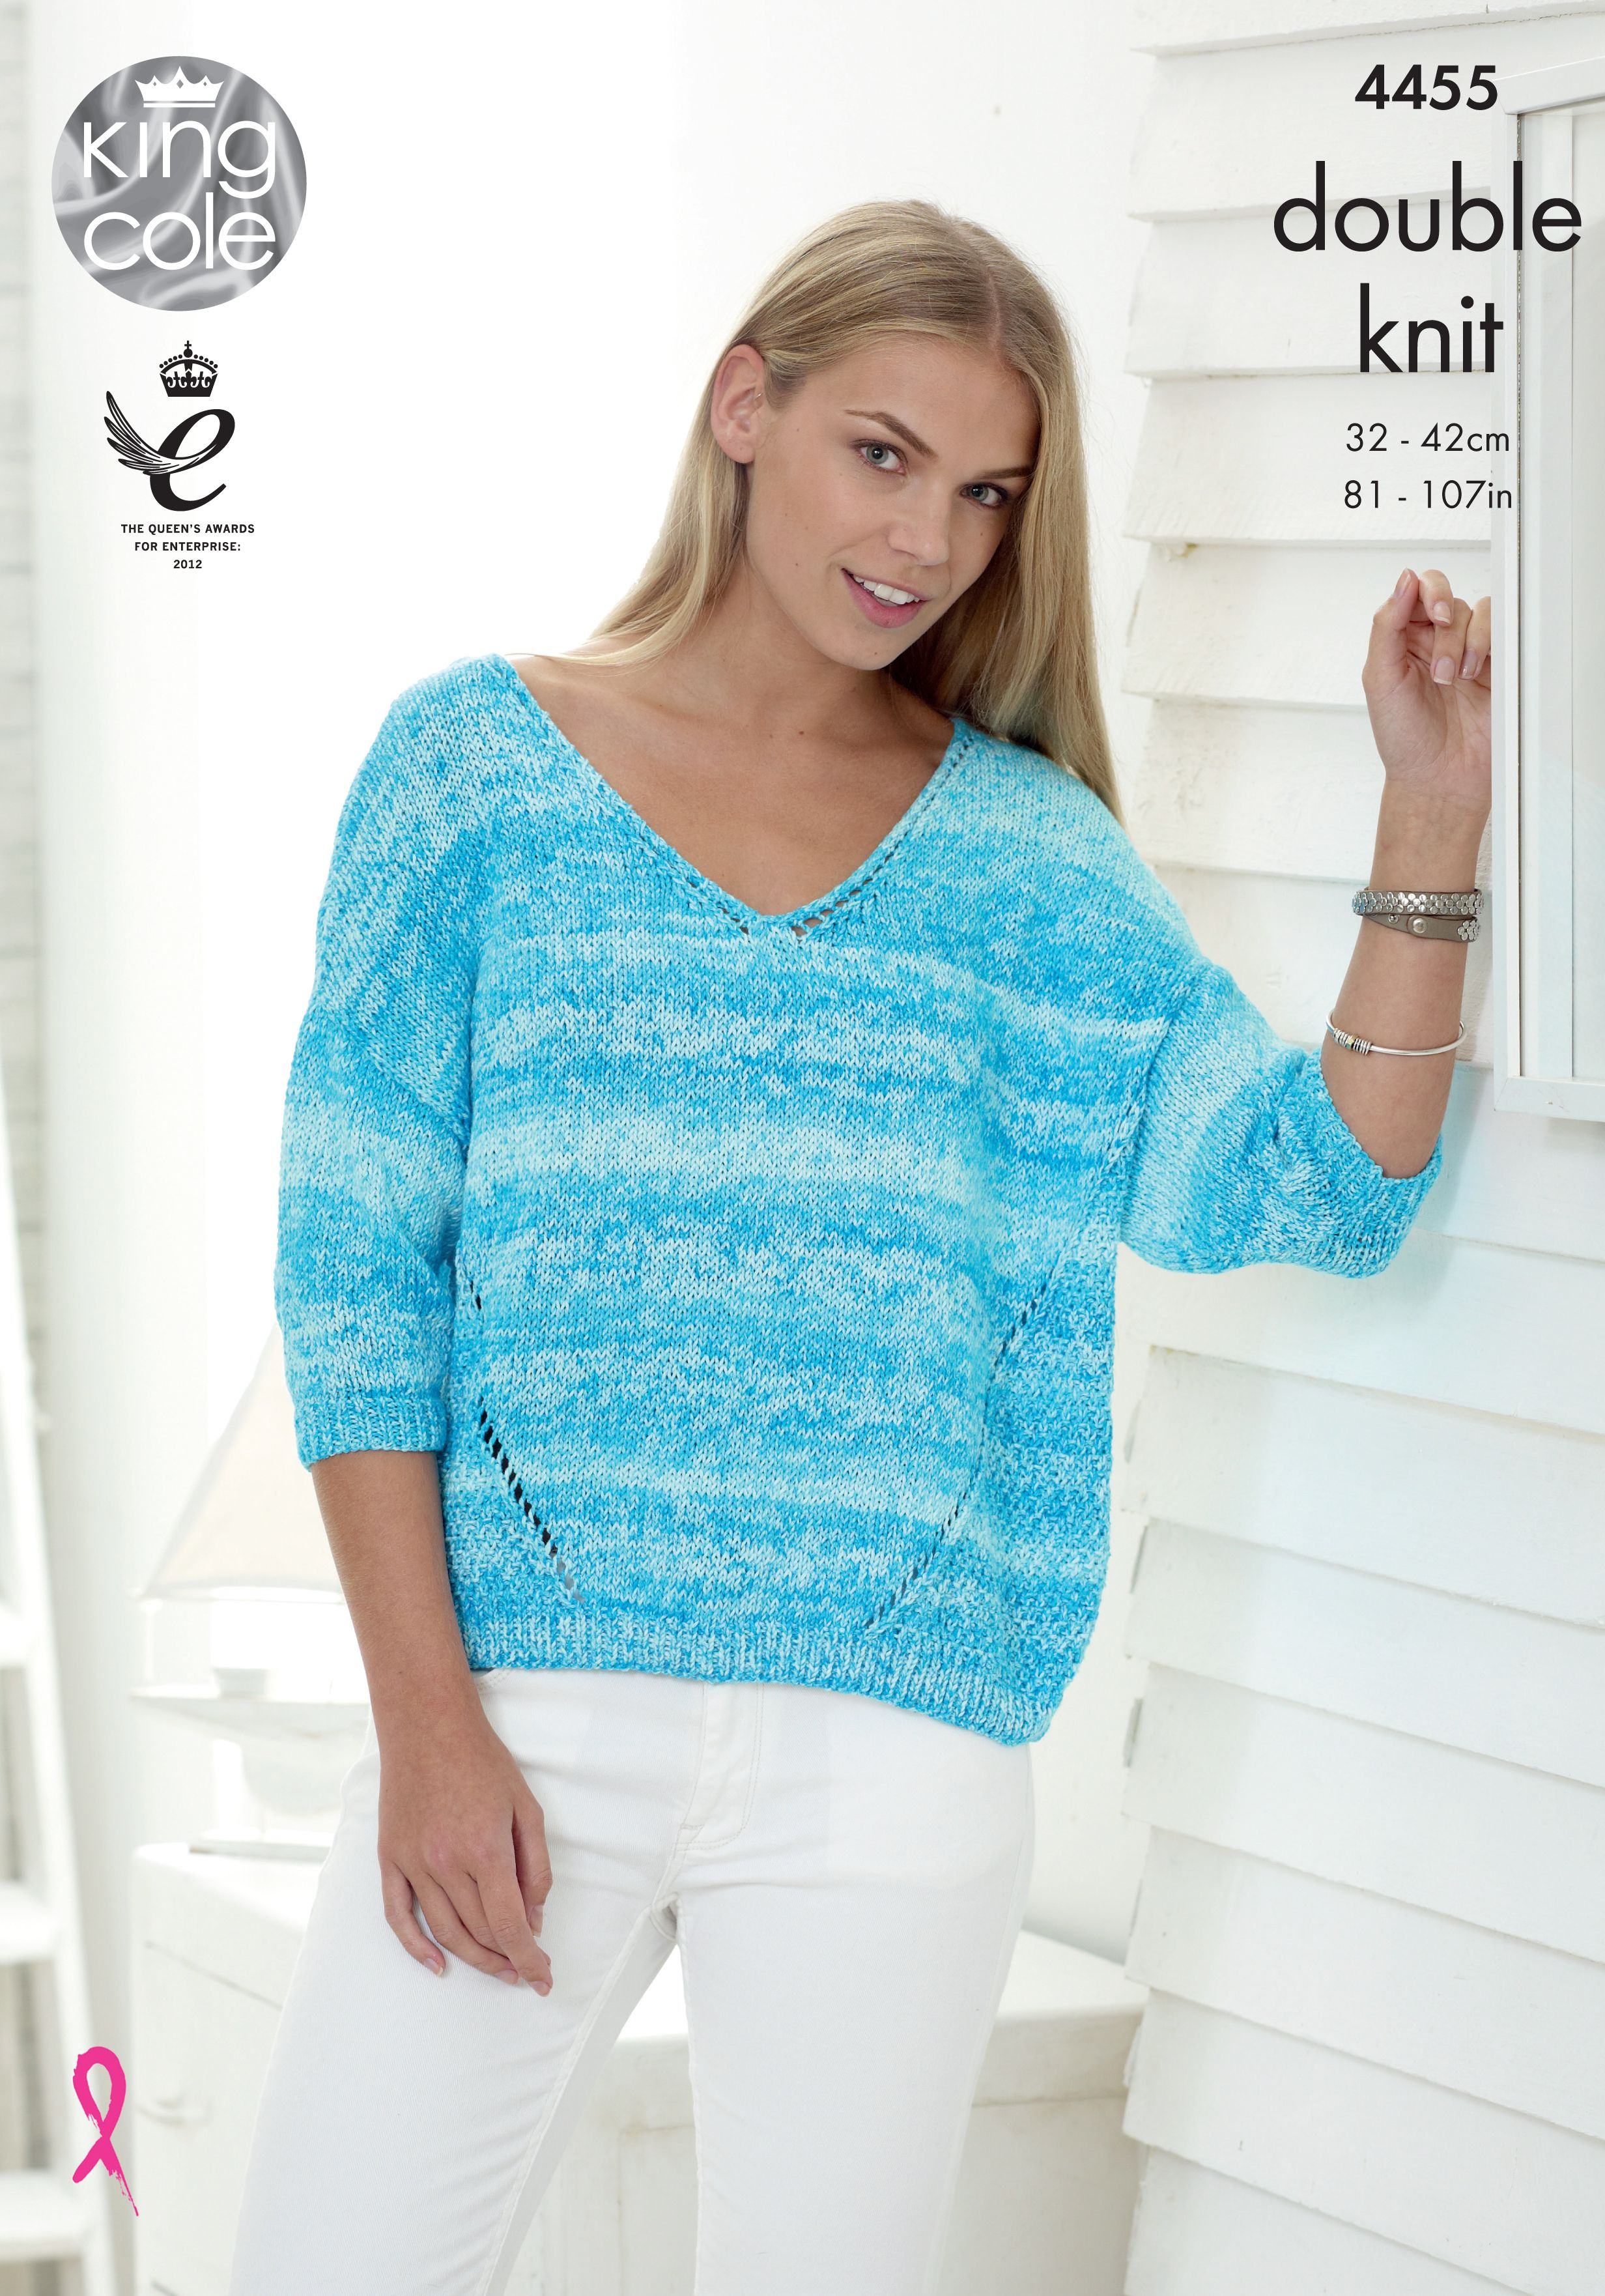 859e7d267f178e Ladies Sweaters - King Cole Pattern 4455